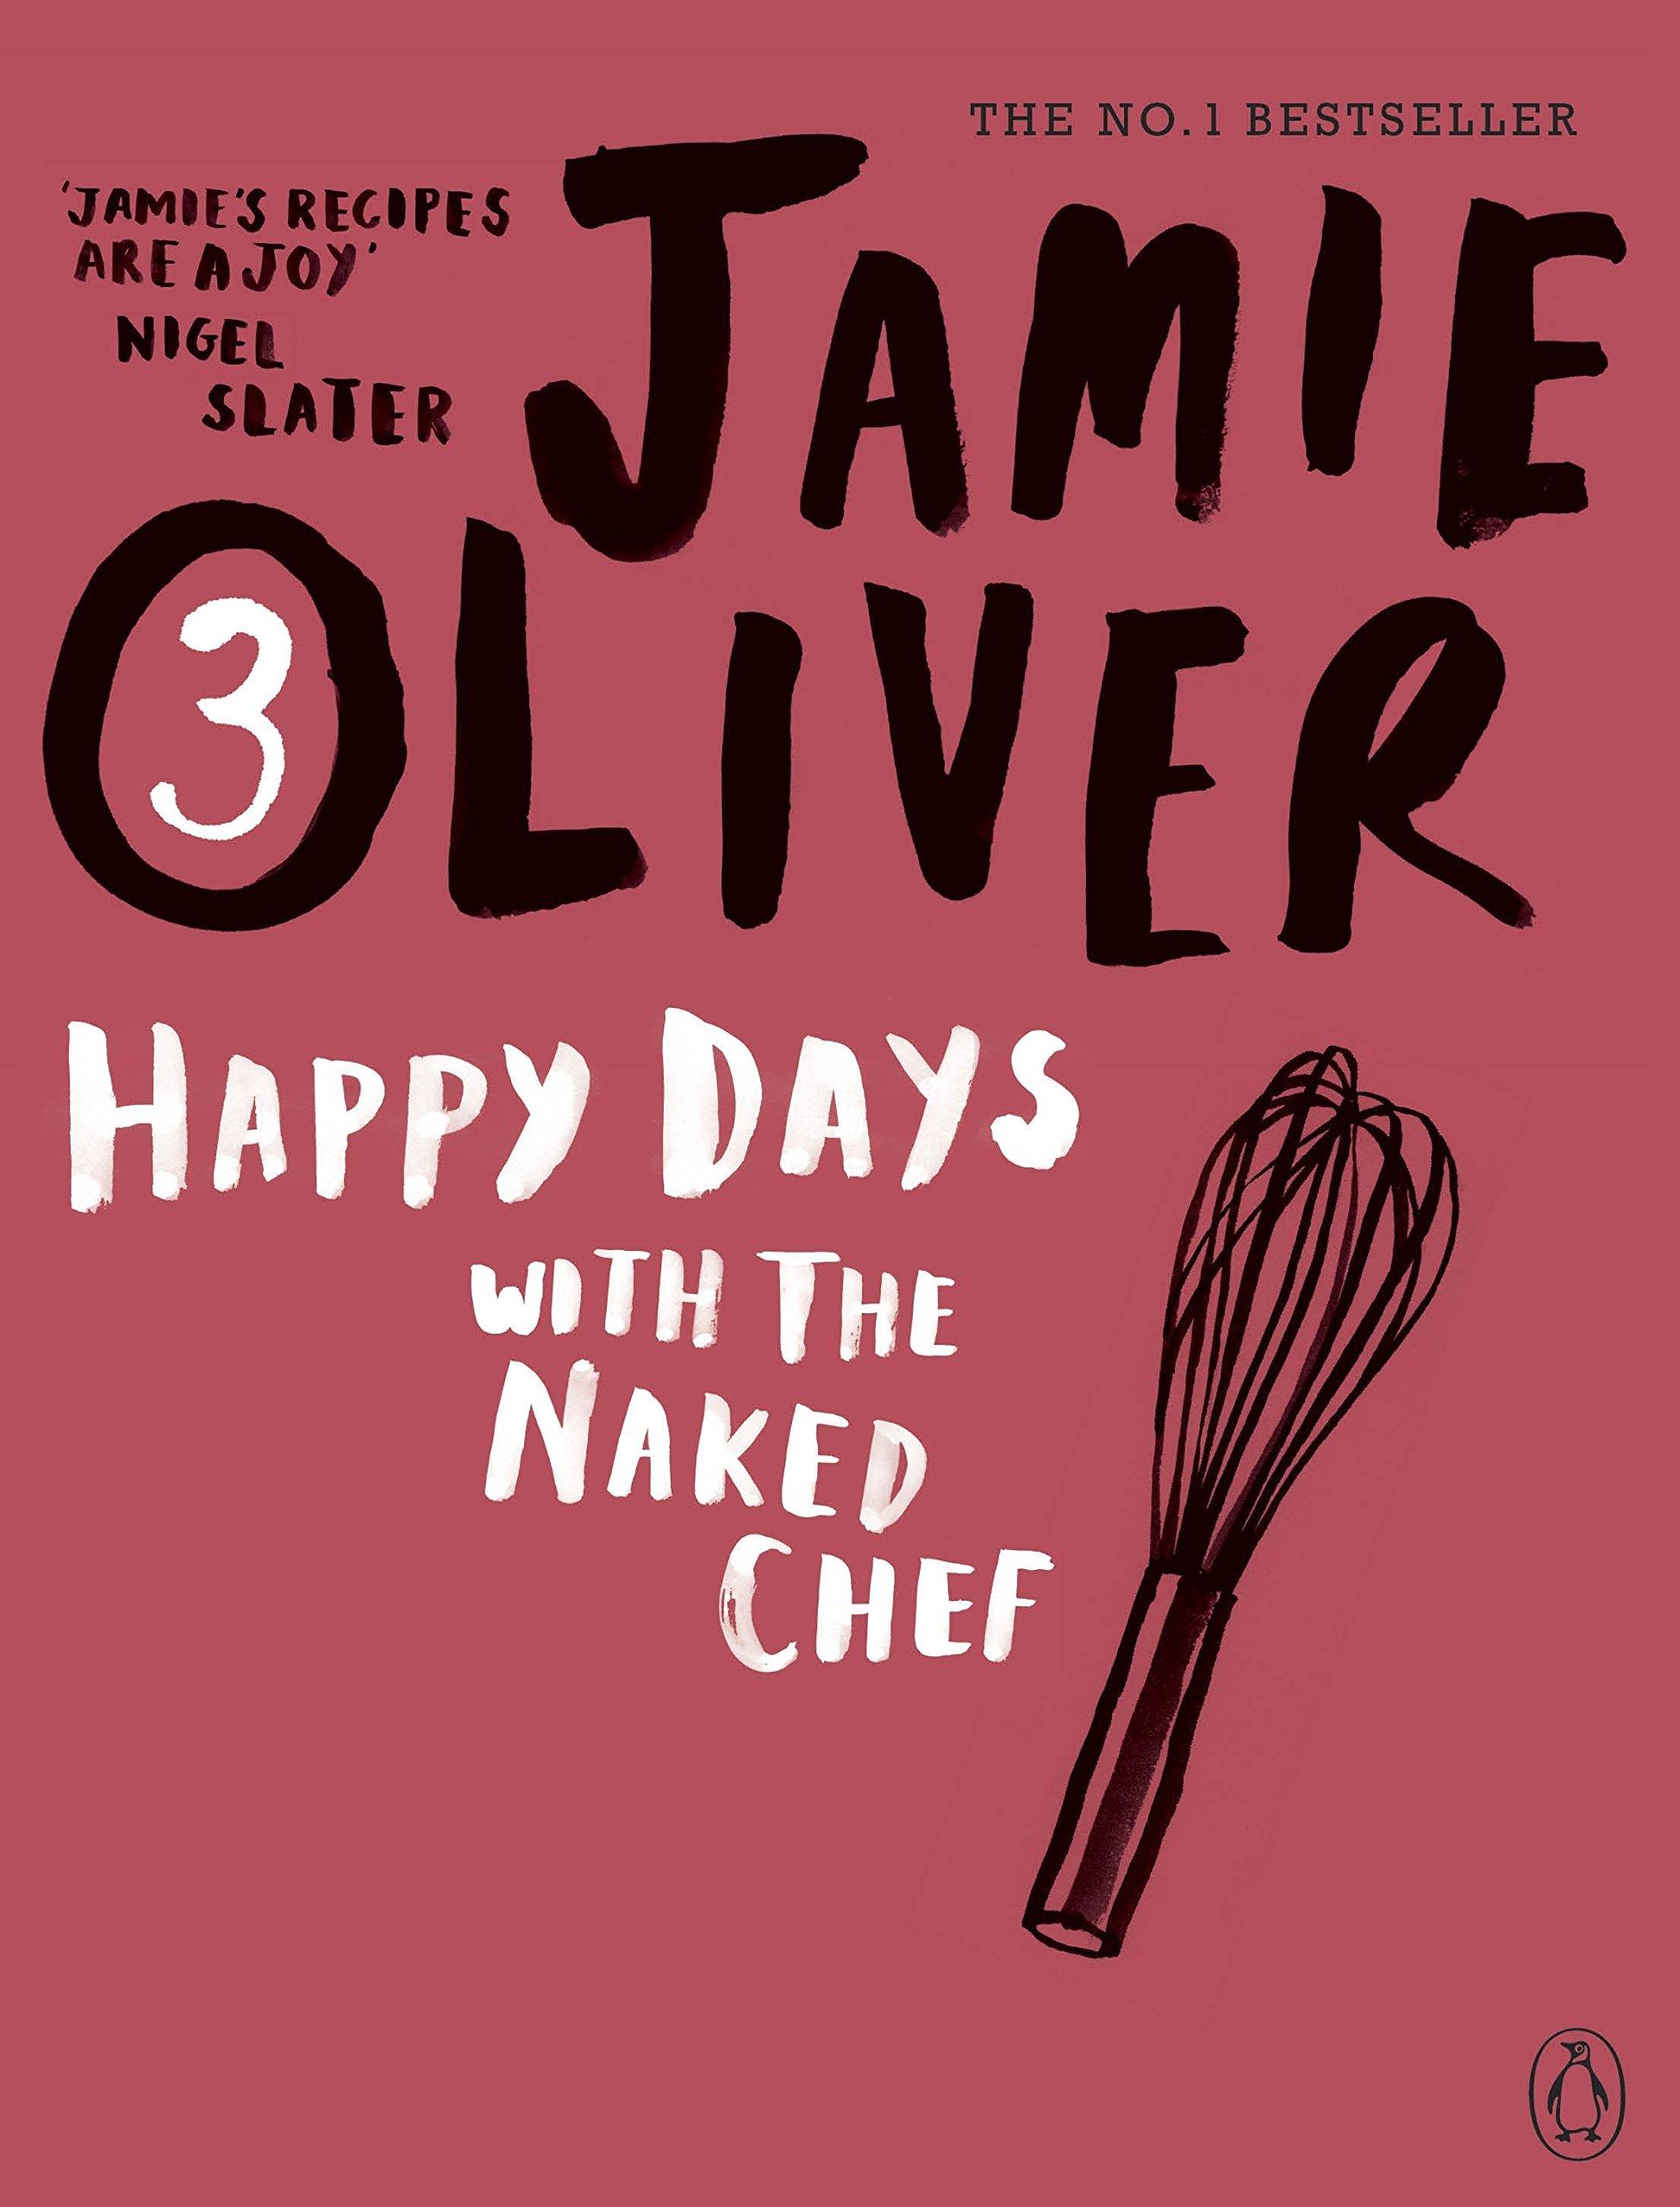 Happy Days with the Naked Chef: Amazon.co.uk: Jamie Oliver: 9780141042985:  Books